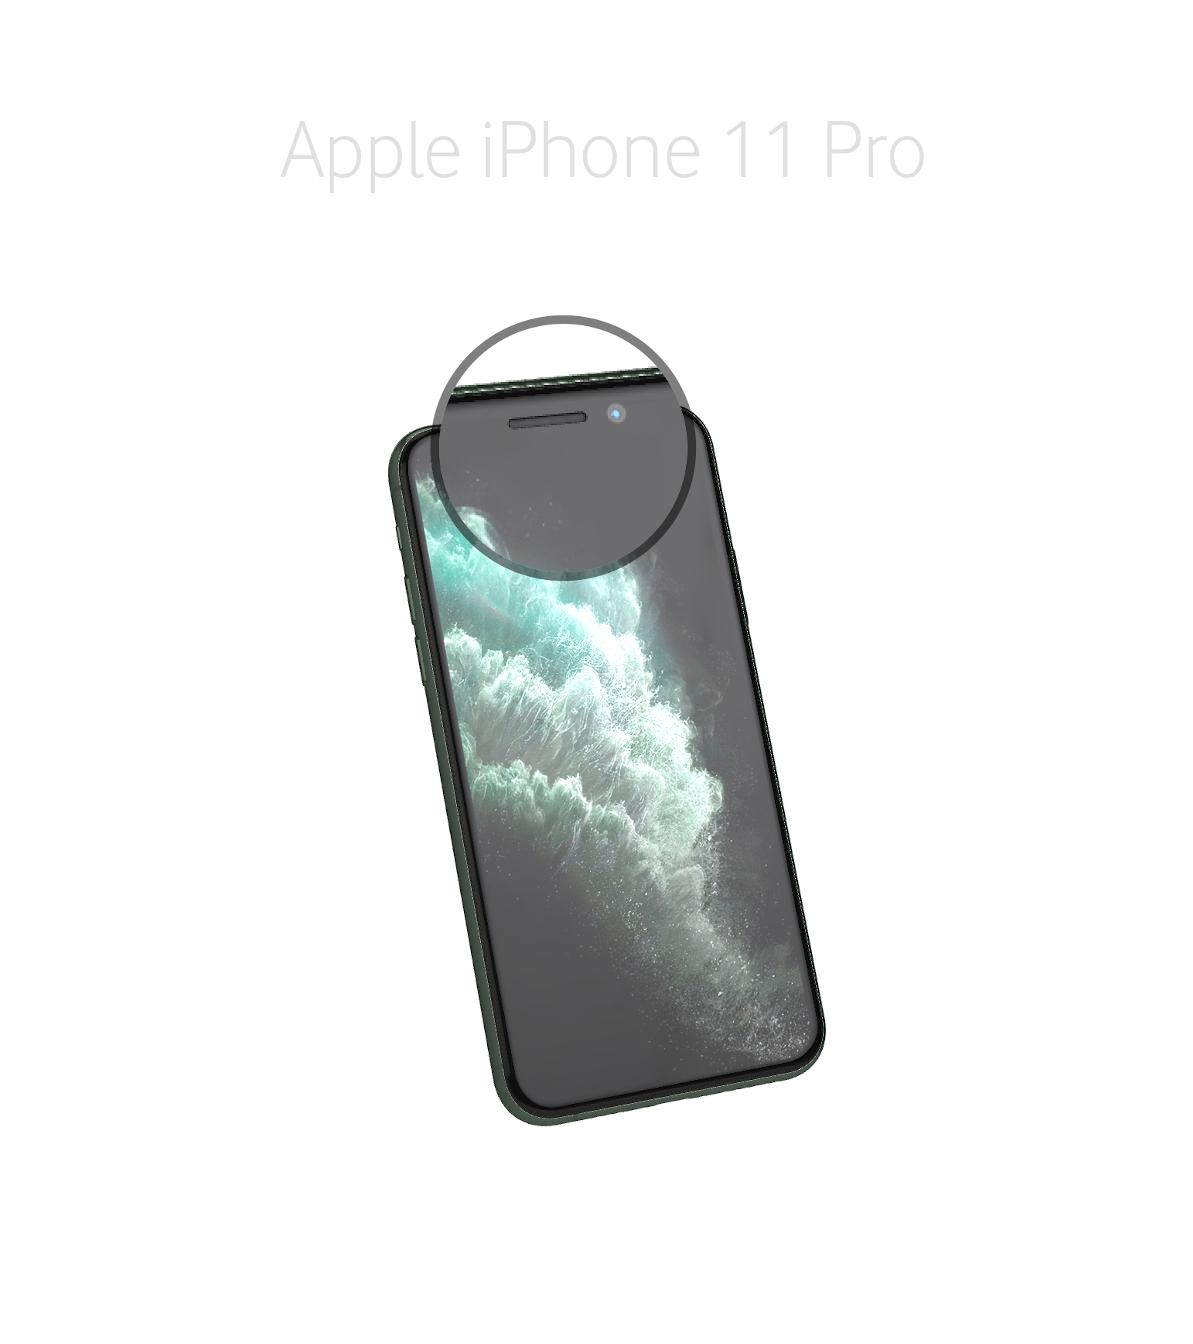 Laga ljussensor (proximity) iPhone 11